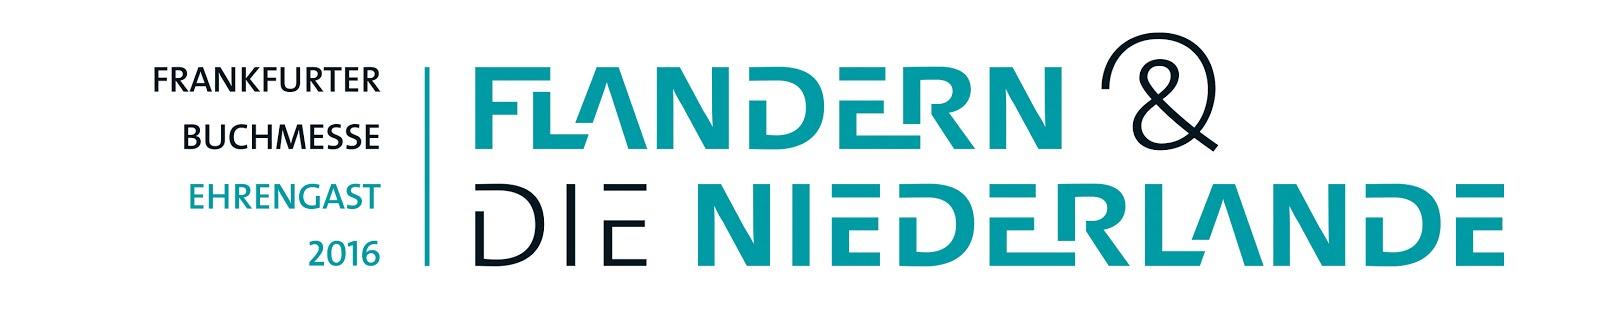 fbf-2016_flandern-nl